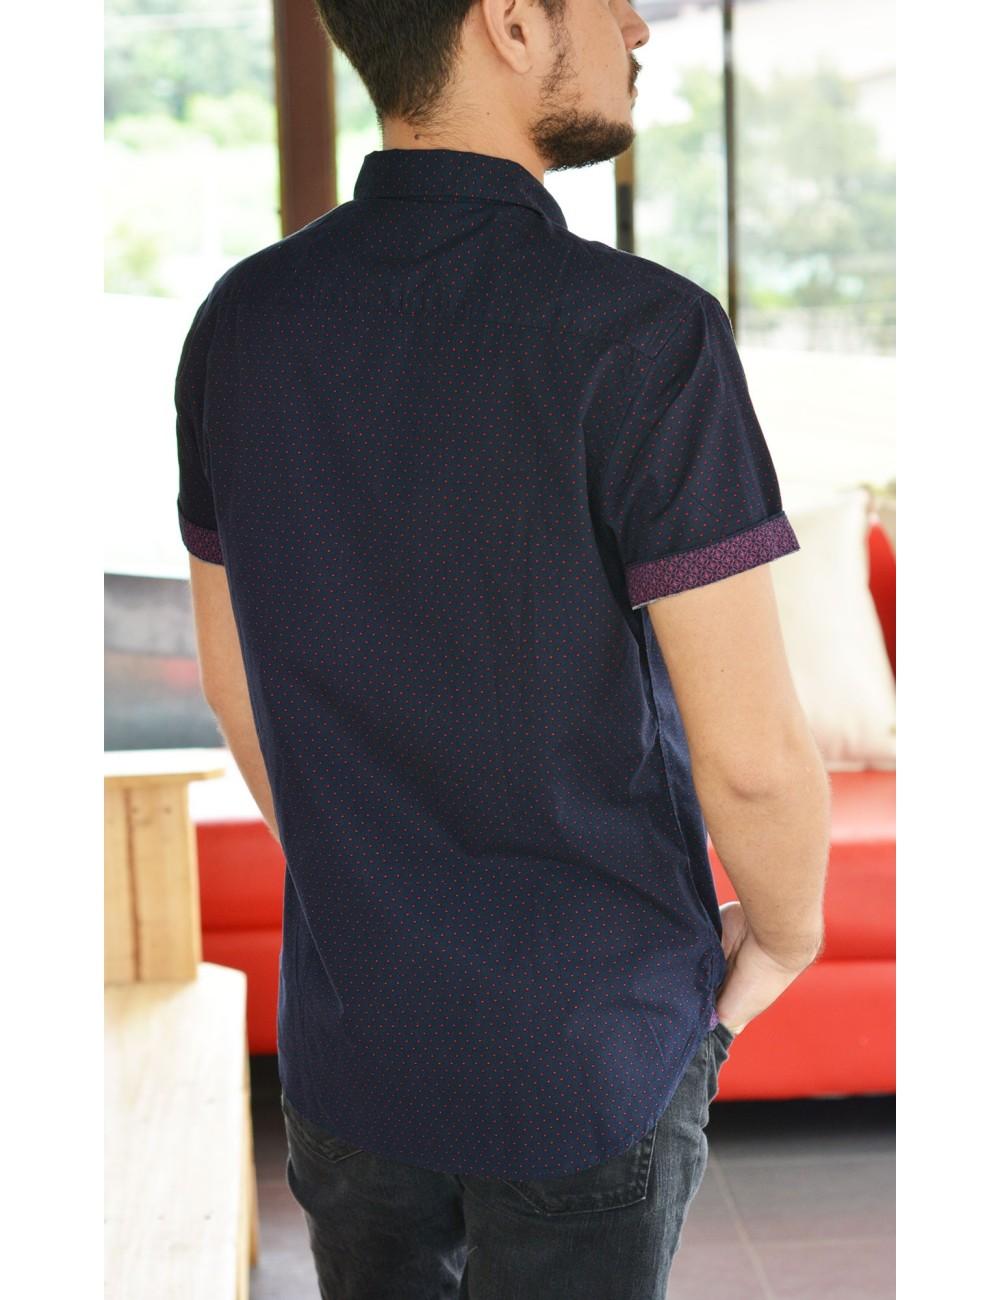 Camisa azul con puntos rojos manga corta